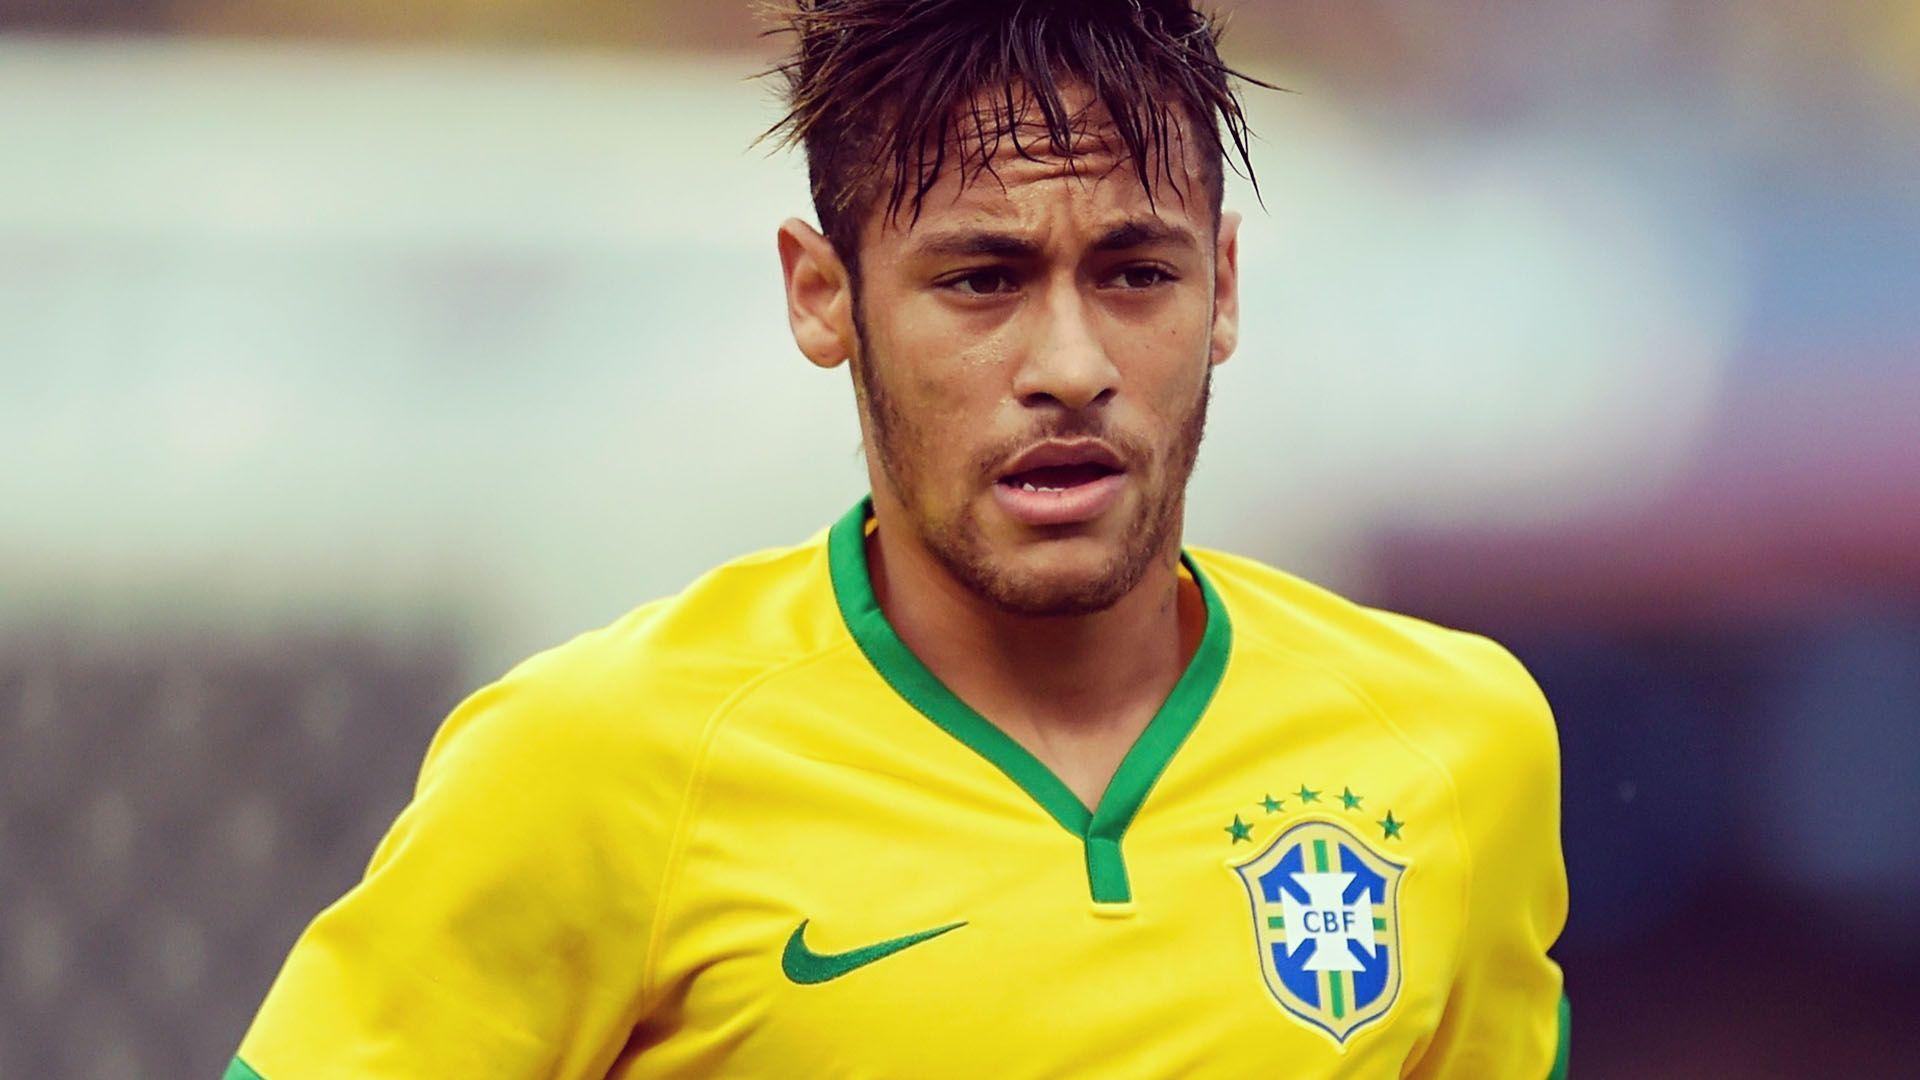 Hd Images Of Neymar: Neymar Brazil Wallpapers 2016 HD